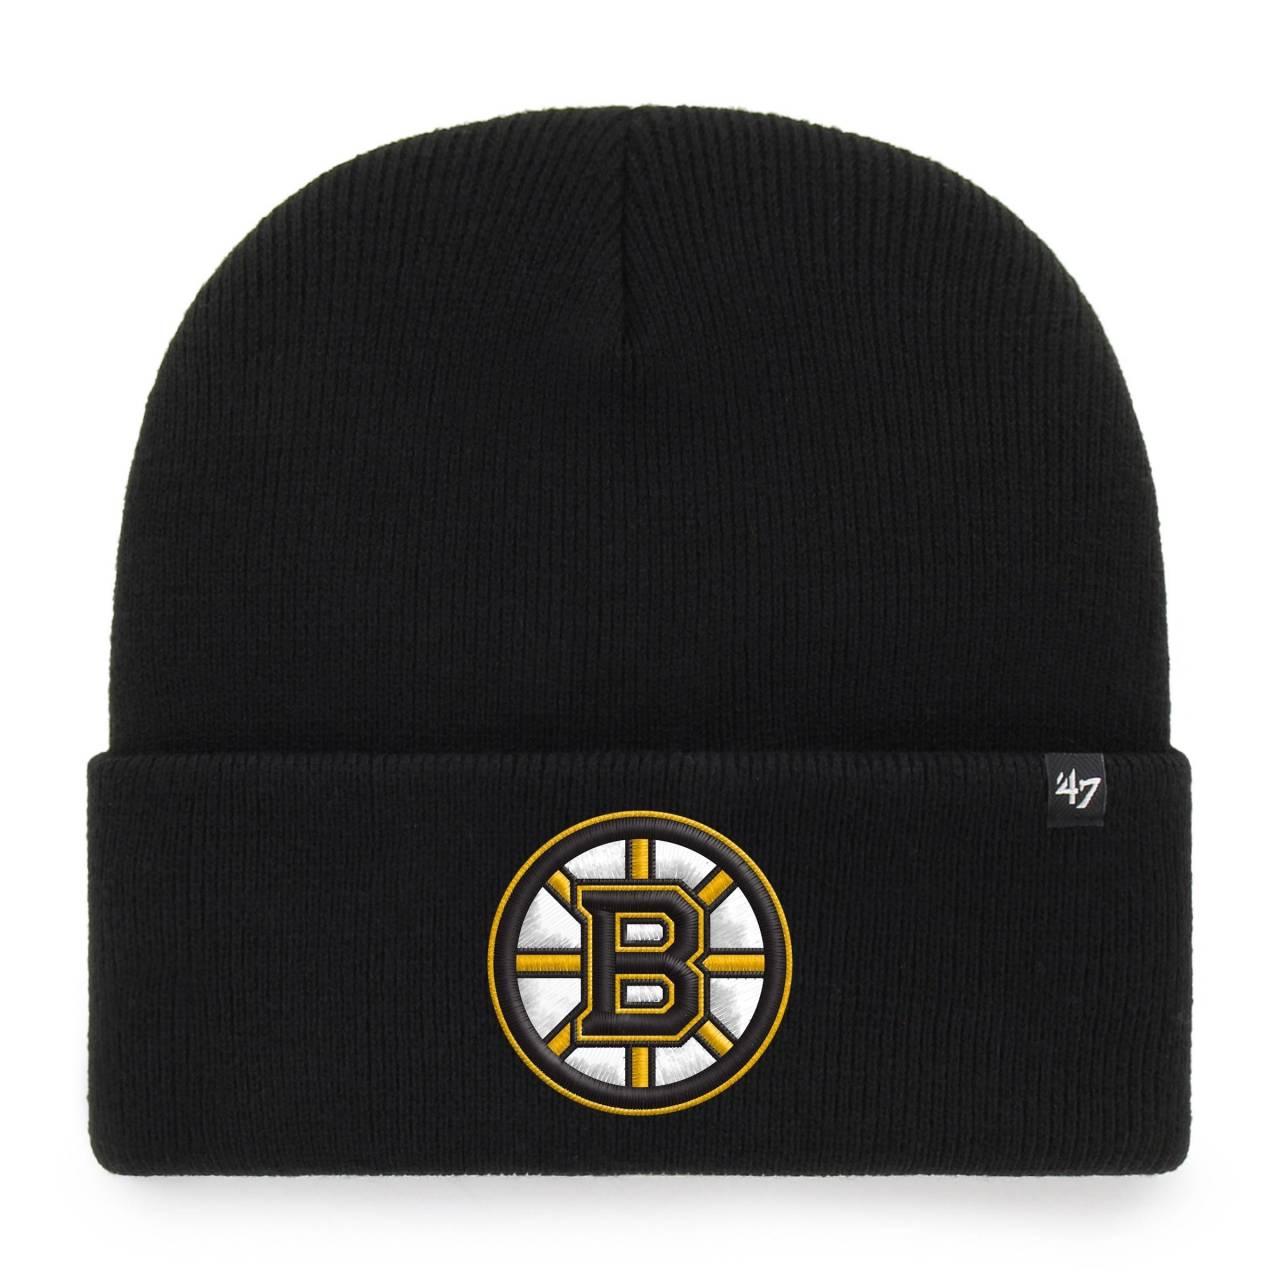 NHL BOSTON BRUINS HAYMAKER ´47 CUFF KNIT BLACK